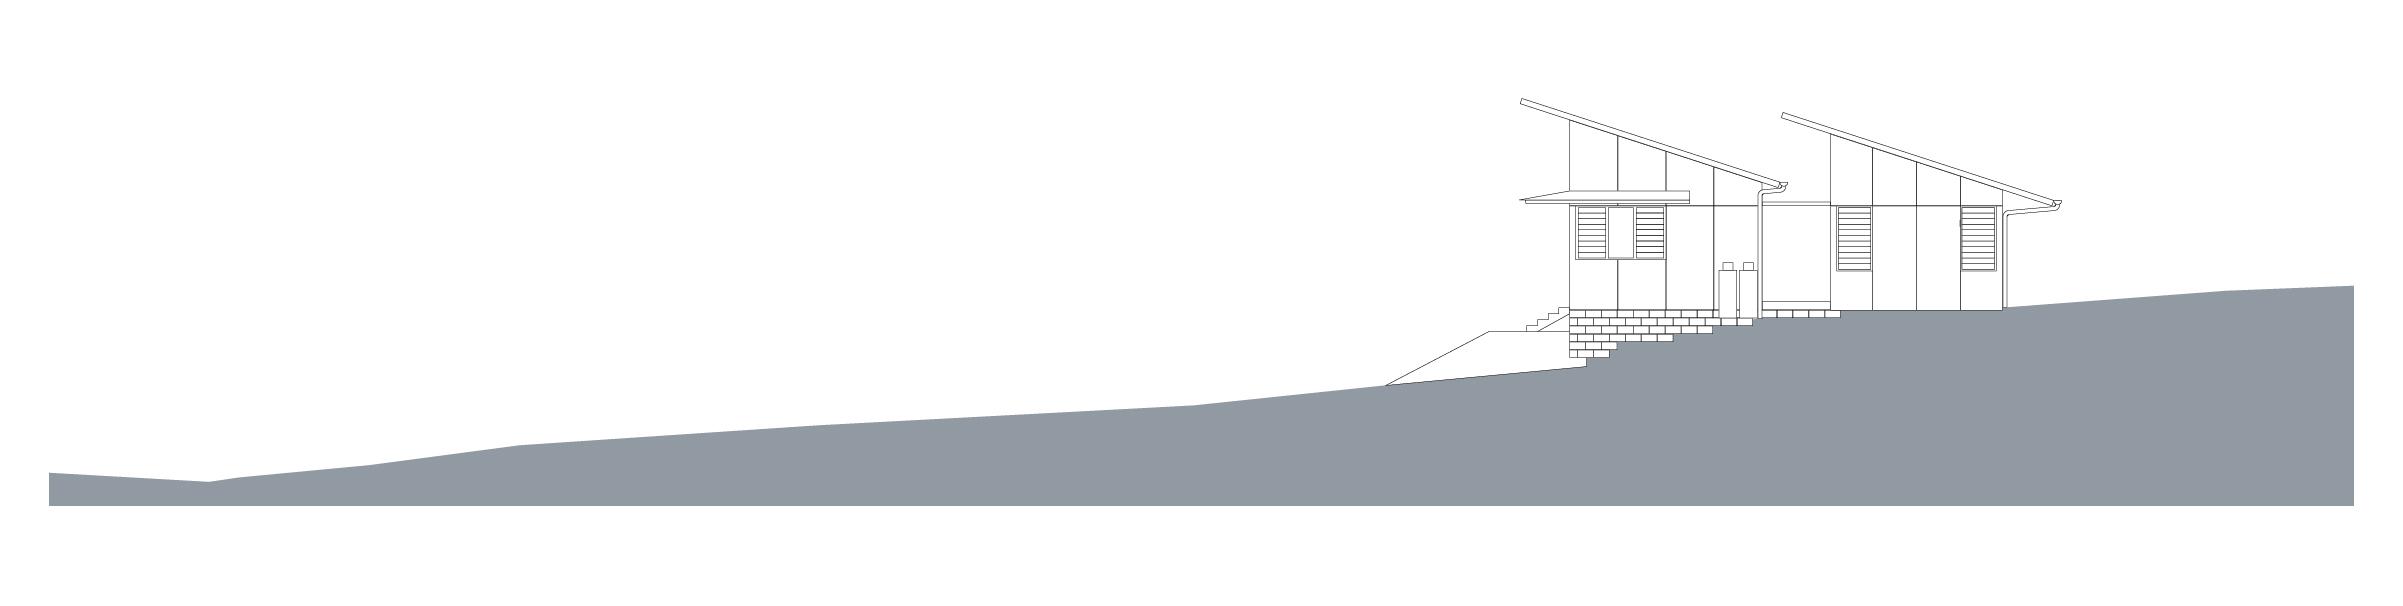 SLH Elevation-02.jpg